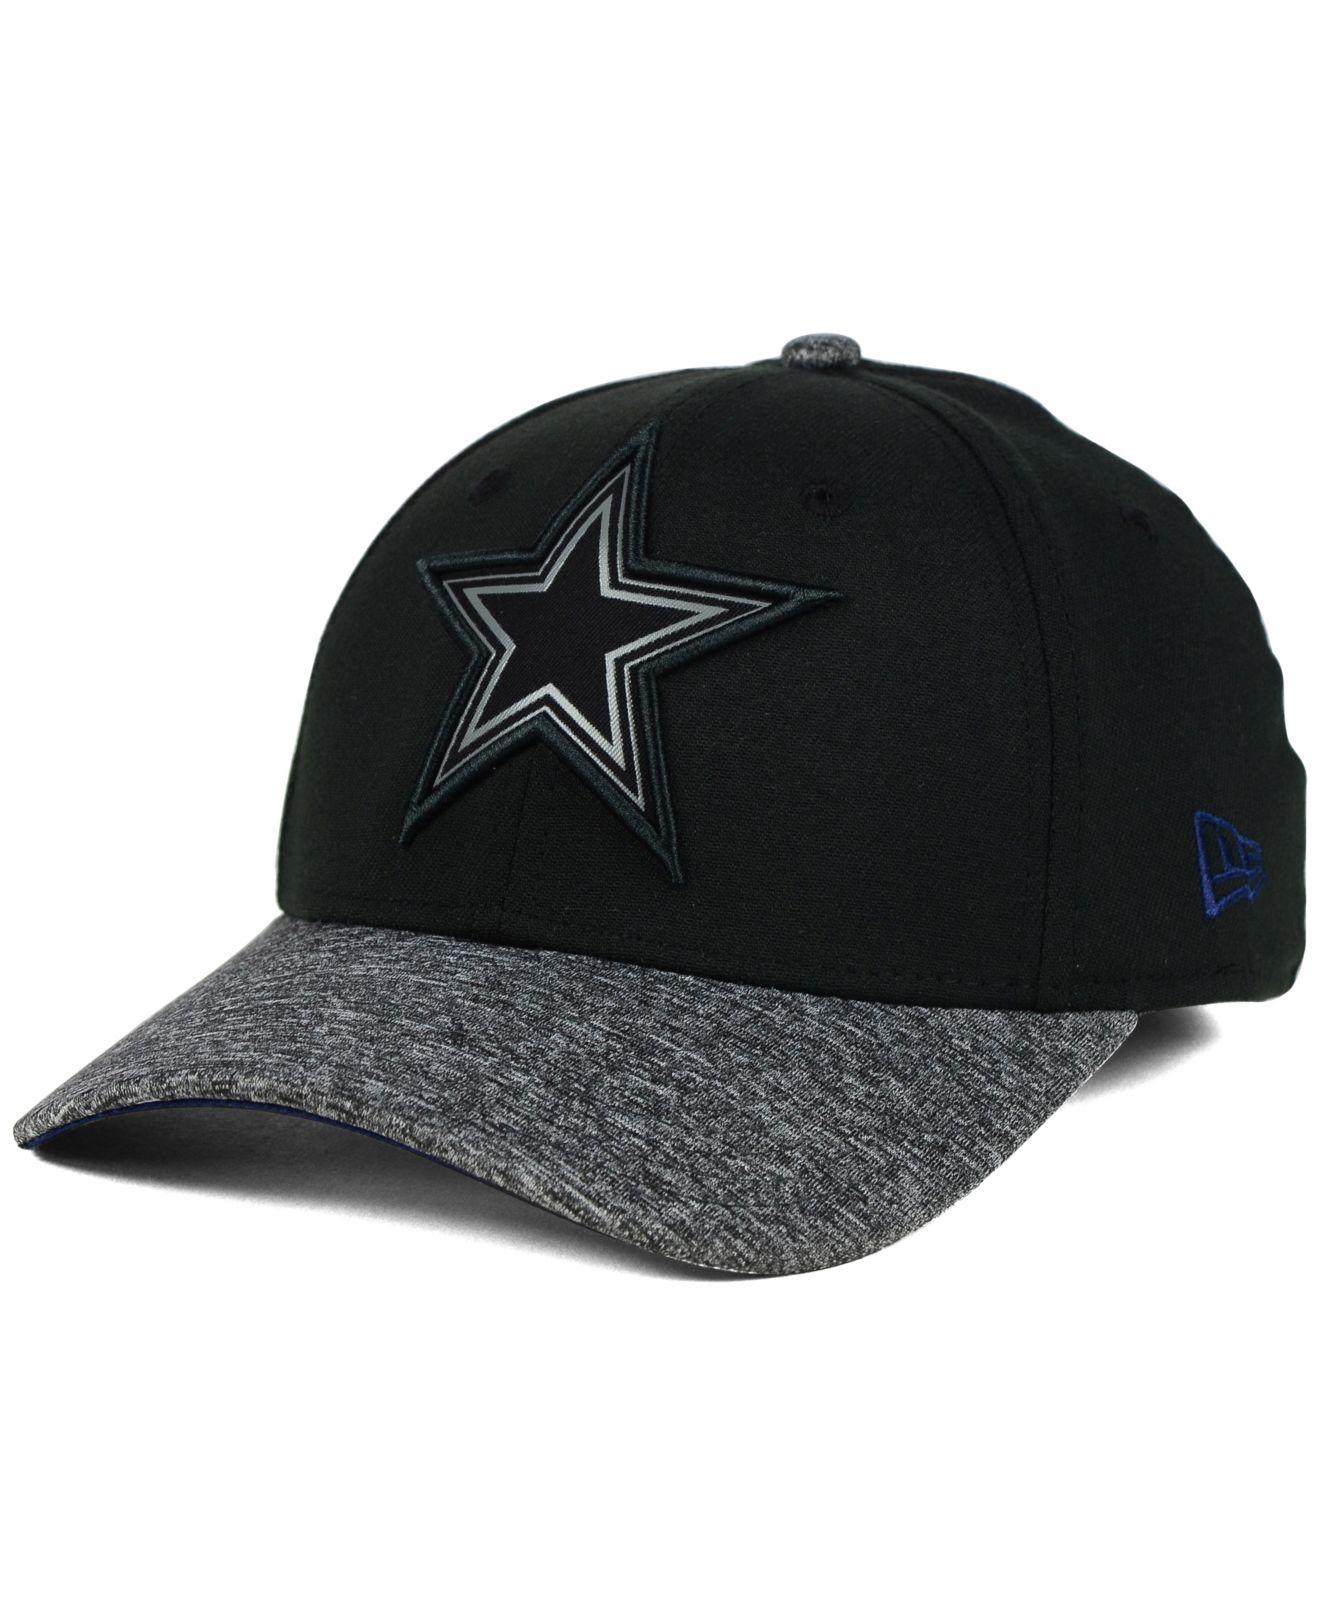 official photos 31dfe 29ee0 KTZ Dallas Cowboys Gridiron 39thirty Cap in Black for Men - Lyst